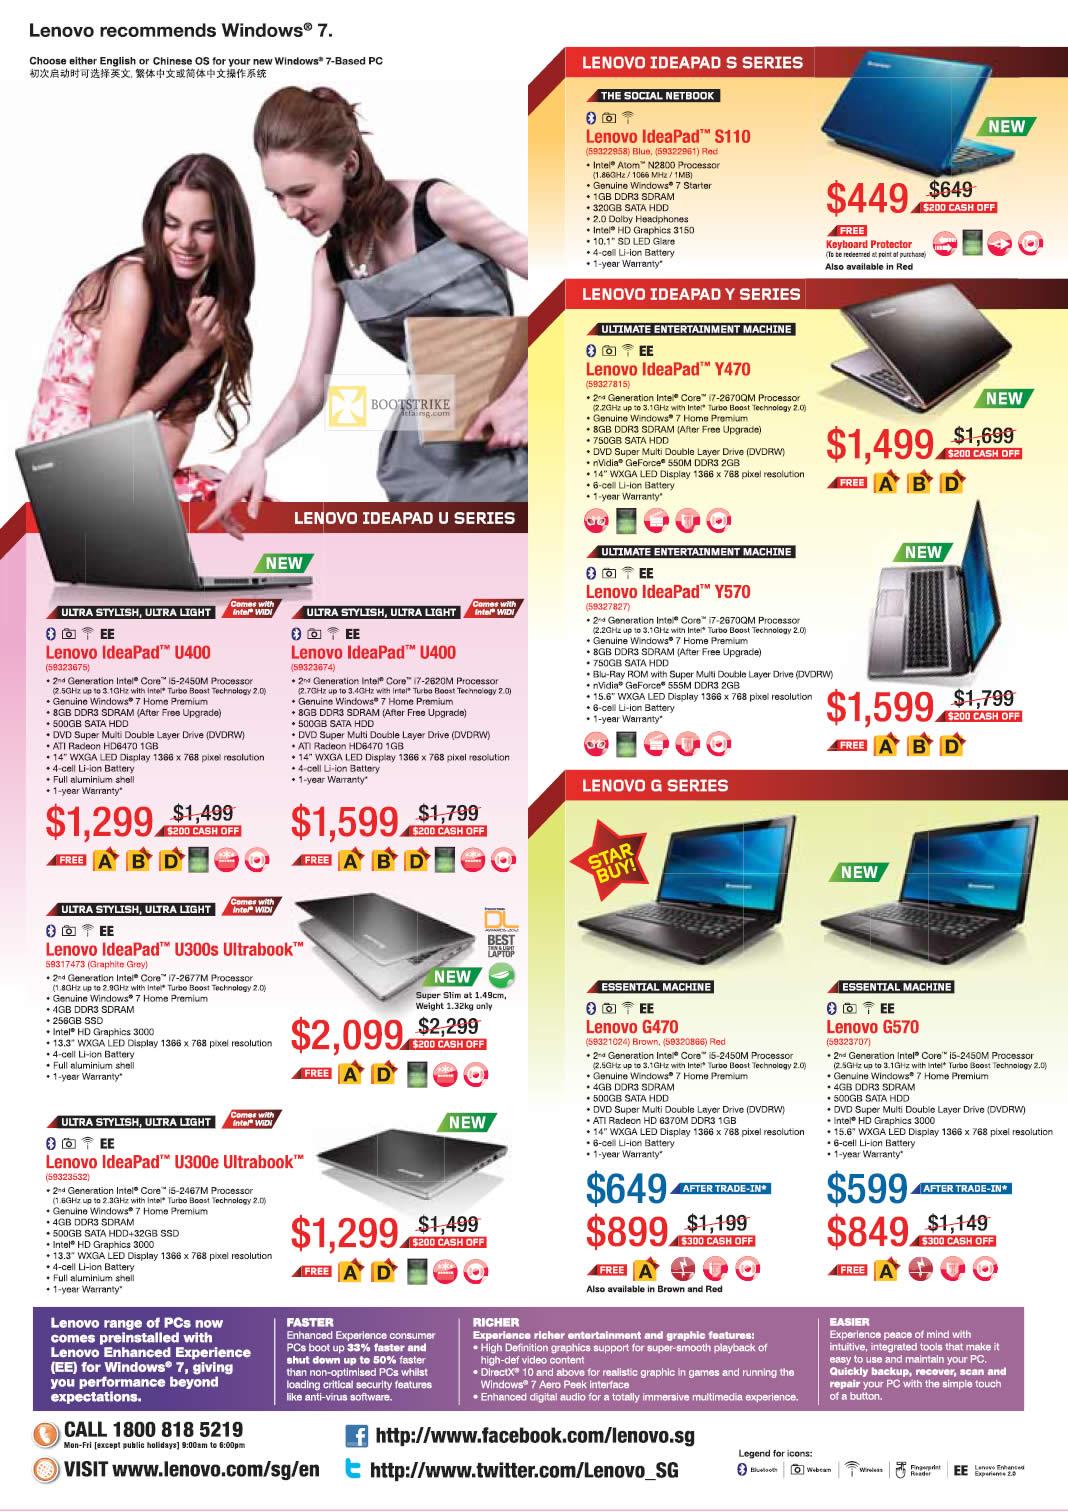 IT SHOW 2012 price list image brochure of Lenovo Notebooks Ideapad S110, Y470, Y570, U400, U300s Ultrabook, U300e, G470, G570